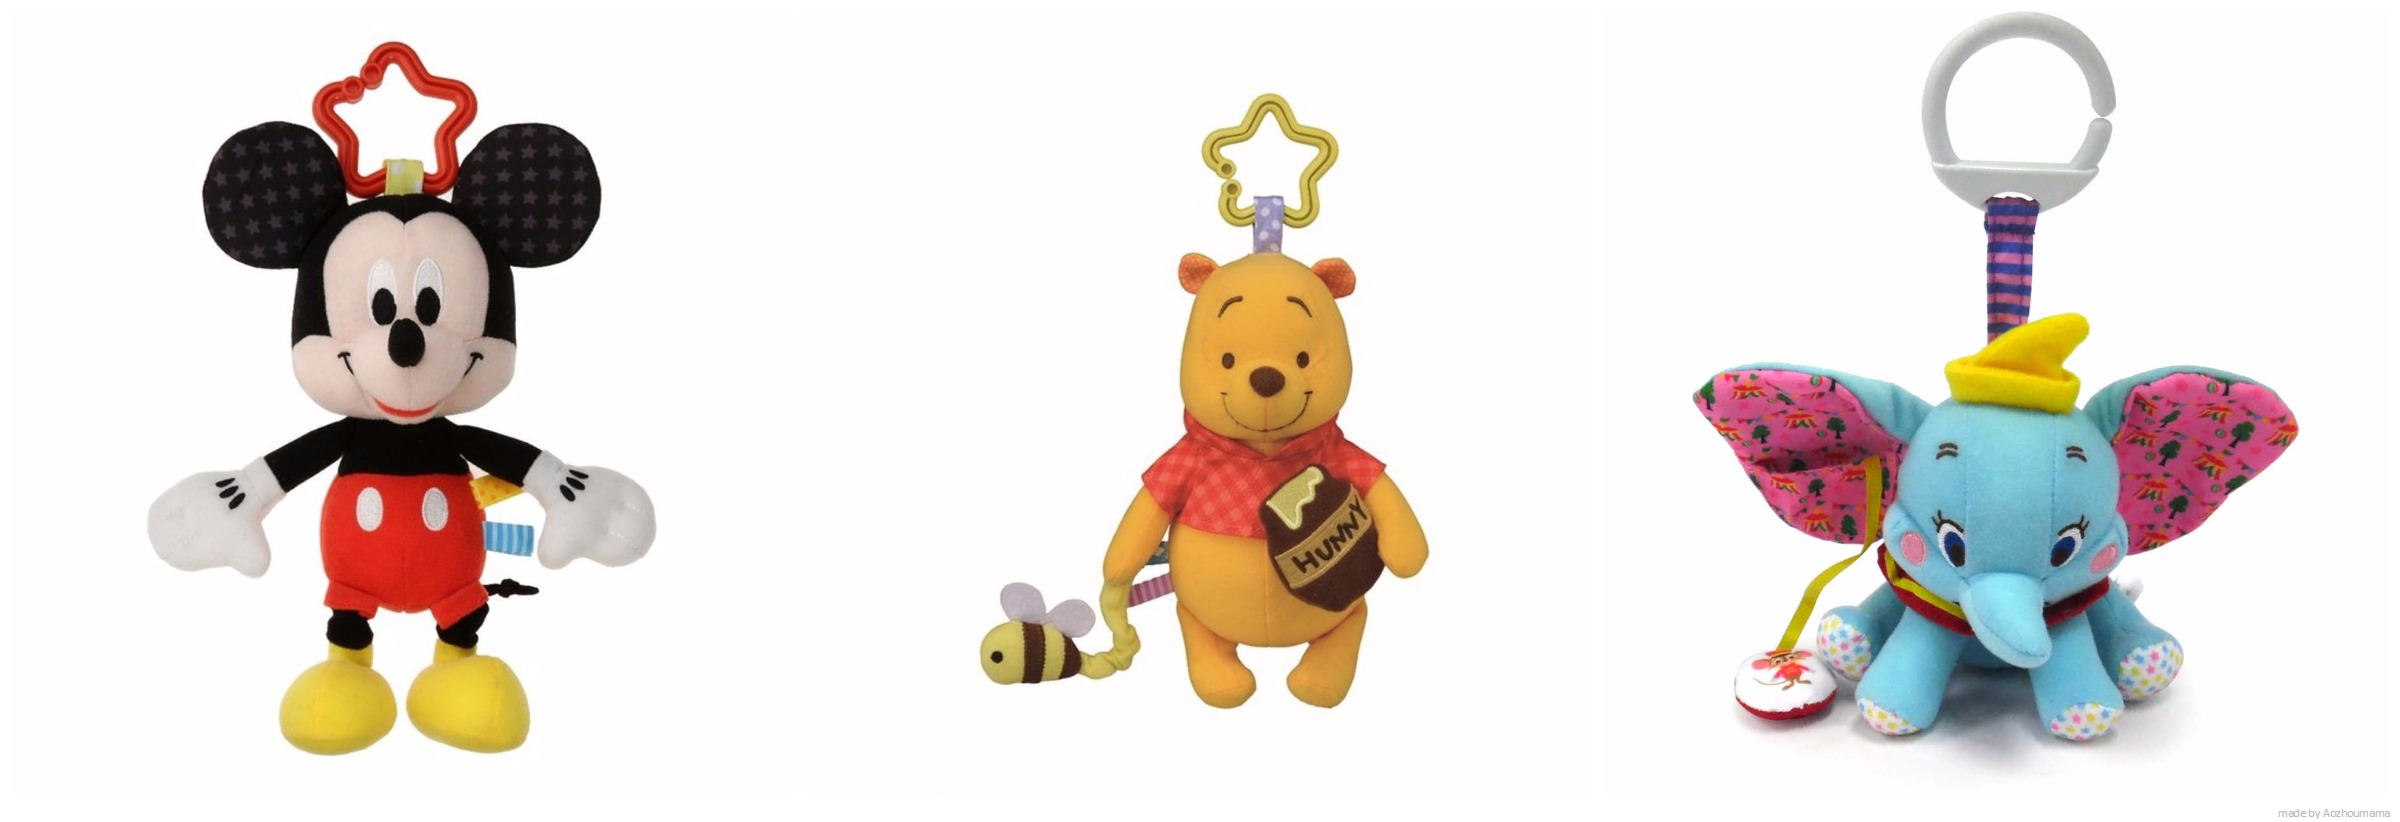 Disney Nursery Plush Plush Pram Toy Multiple Frabric Textures Ebay